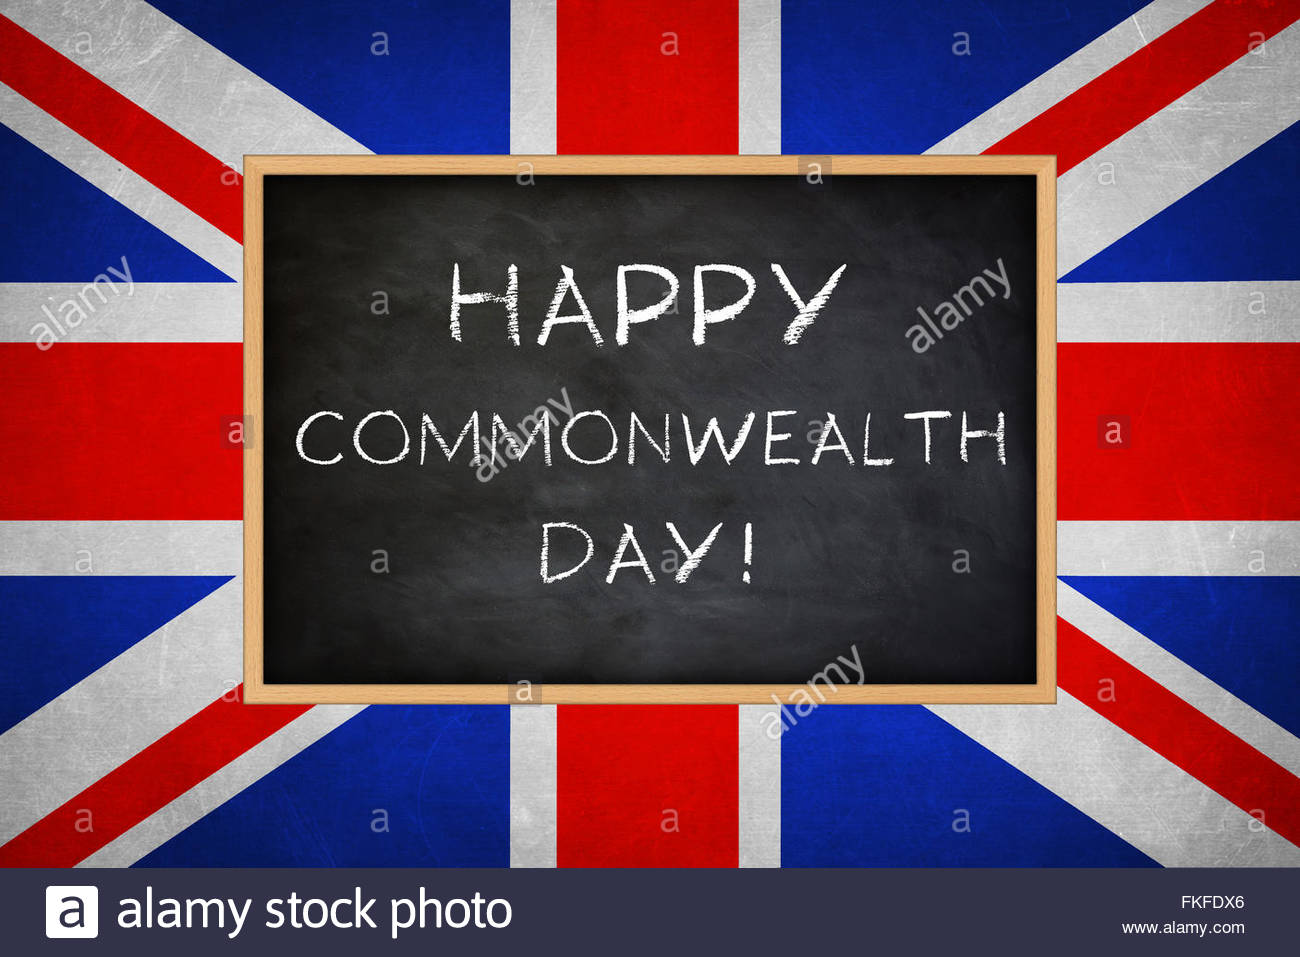 Happy Commonwealth Day - Stock Image